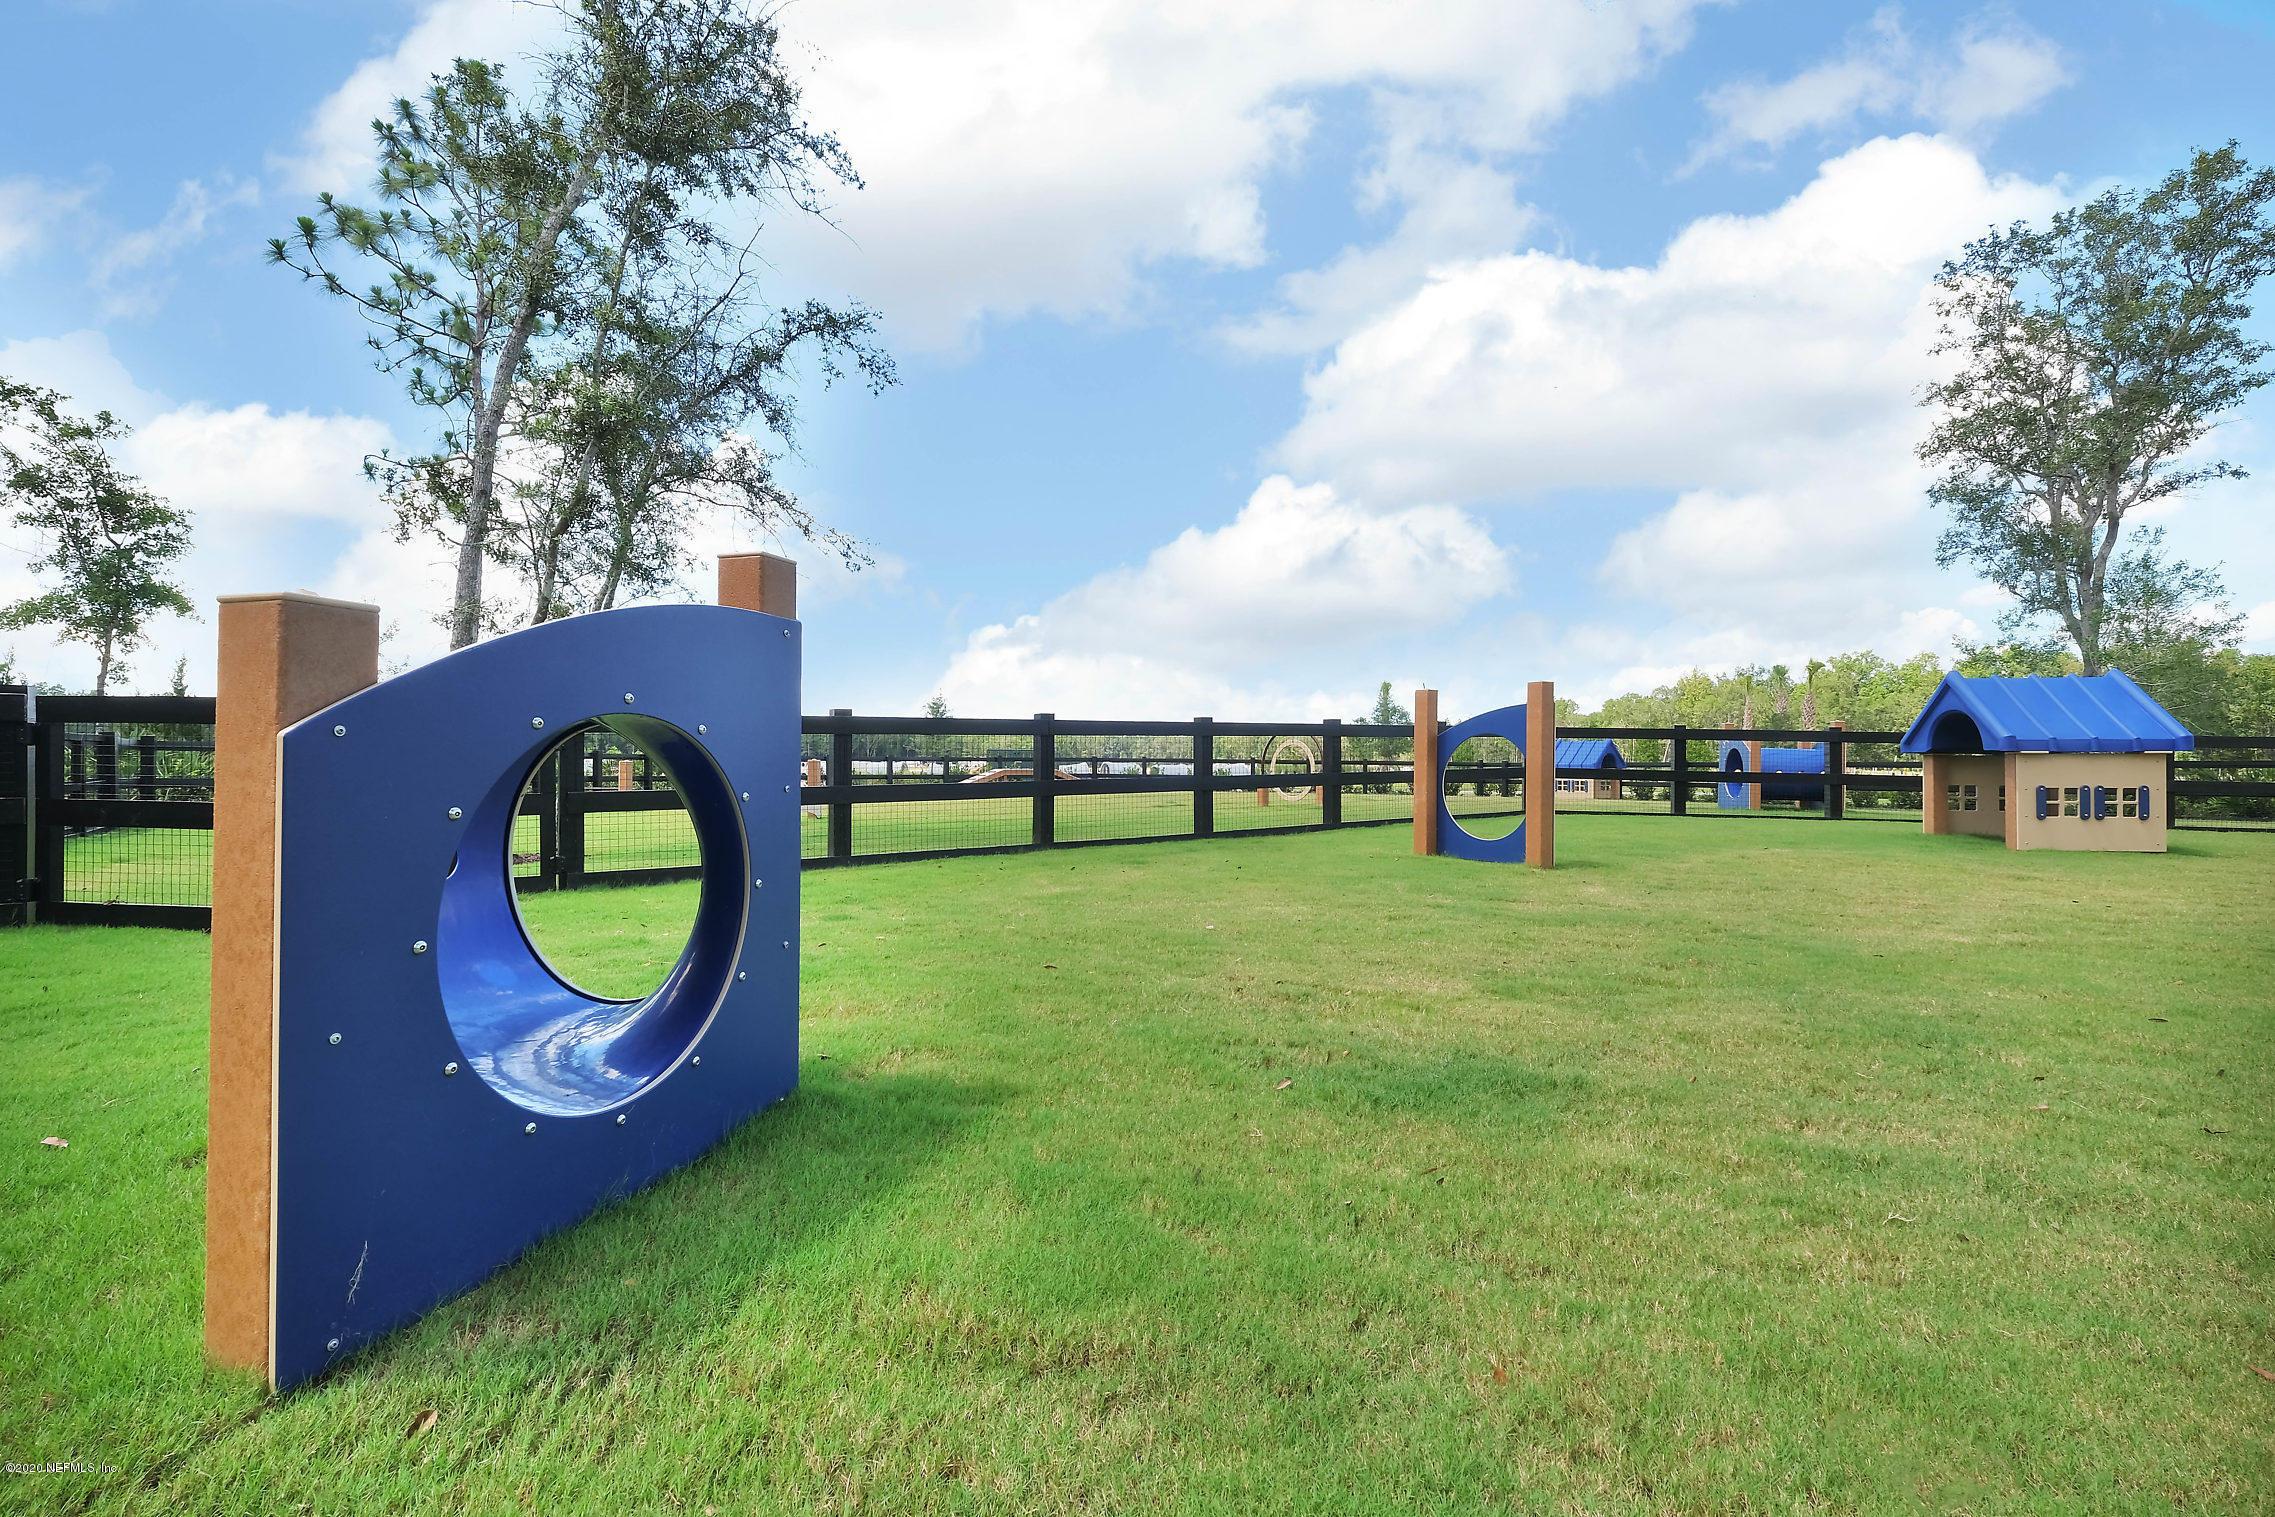 337 KELLET, ST JOHNS, FLORIDA 32259, 2 Bedrooms Bedrooms, ,2 BathroomsBathrooms,Residential,For sale,KELLET,1049111